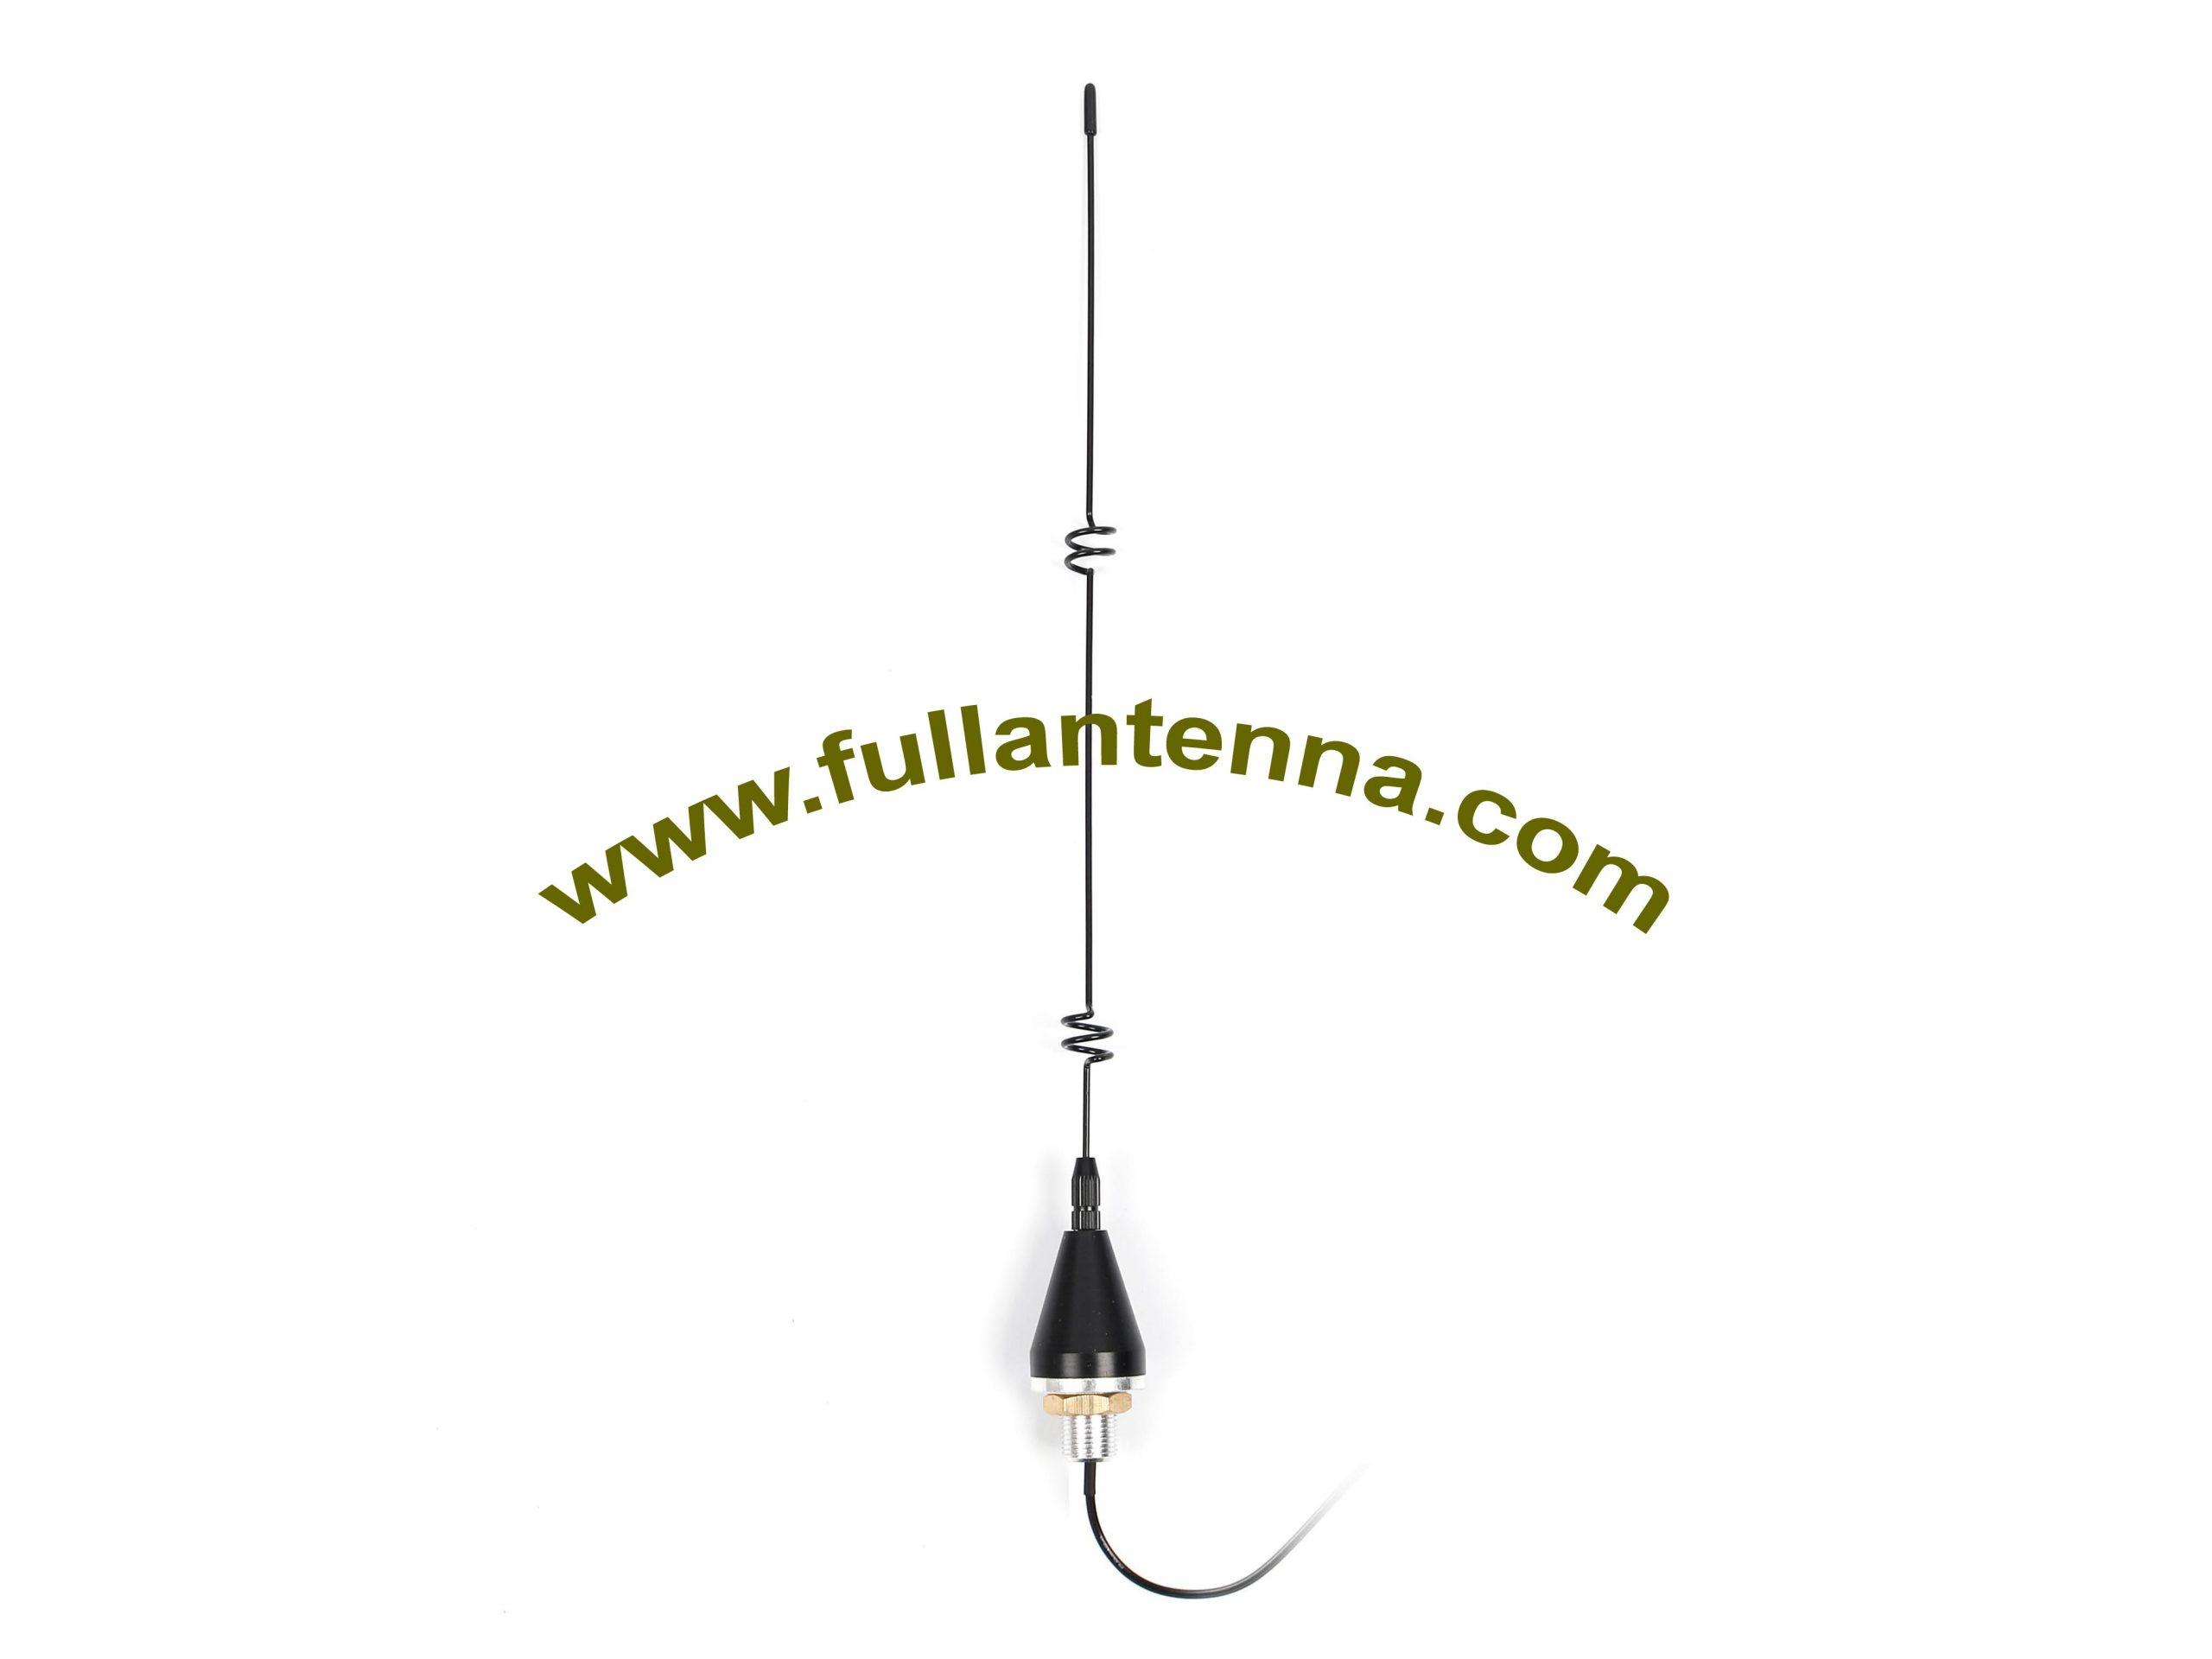 P/N:FALTE.0603,4G/LTE External Antenna,screw mount metal whip outdoor  LTE antenna